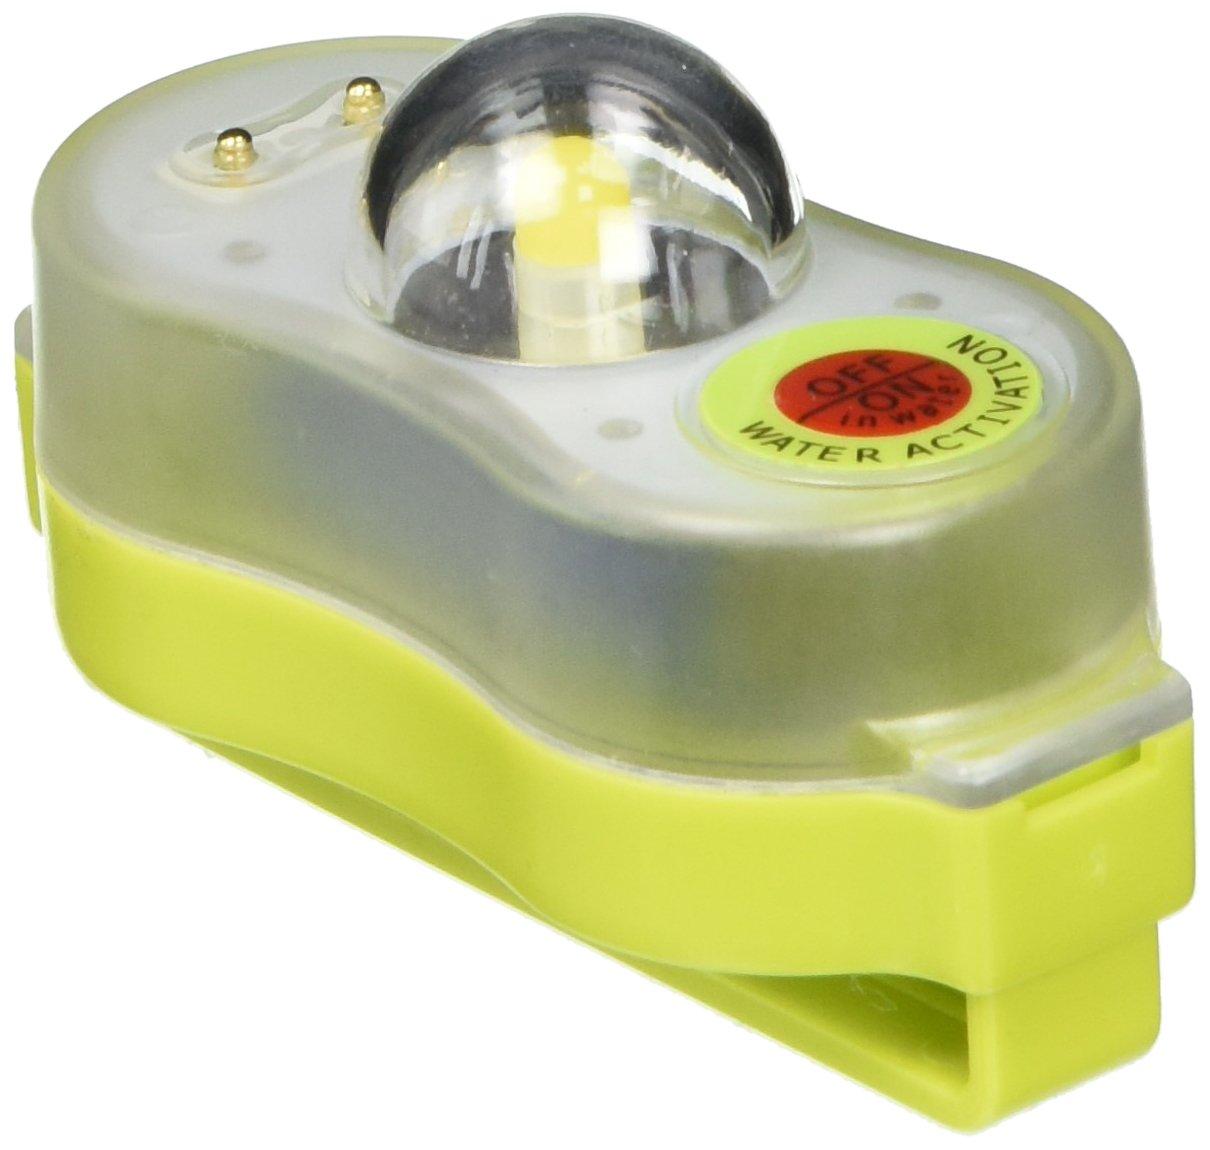 ACR Electronics HemiLight 3 by acr